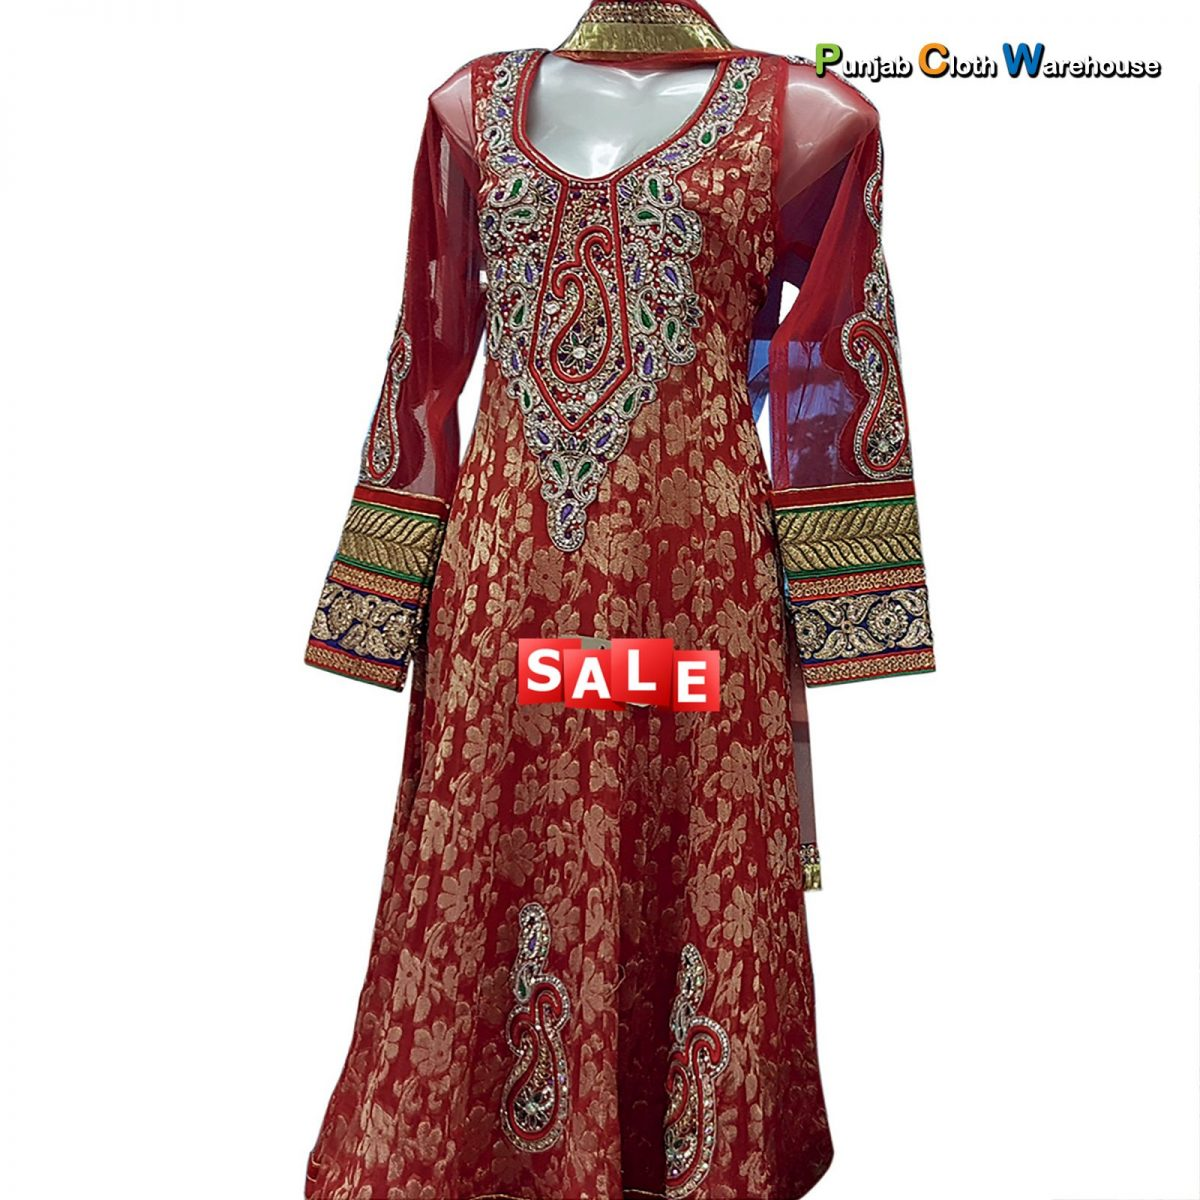 Designer Party Wear Suits, Sarees, Lehengas & Sherwanis (12)